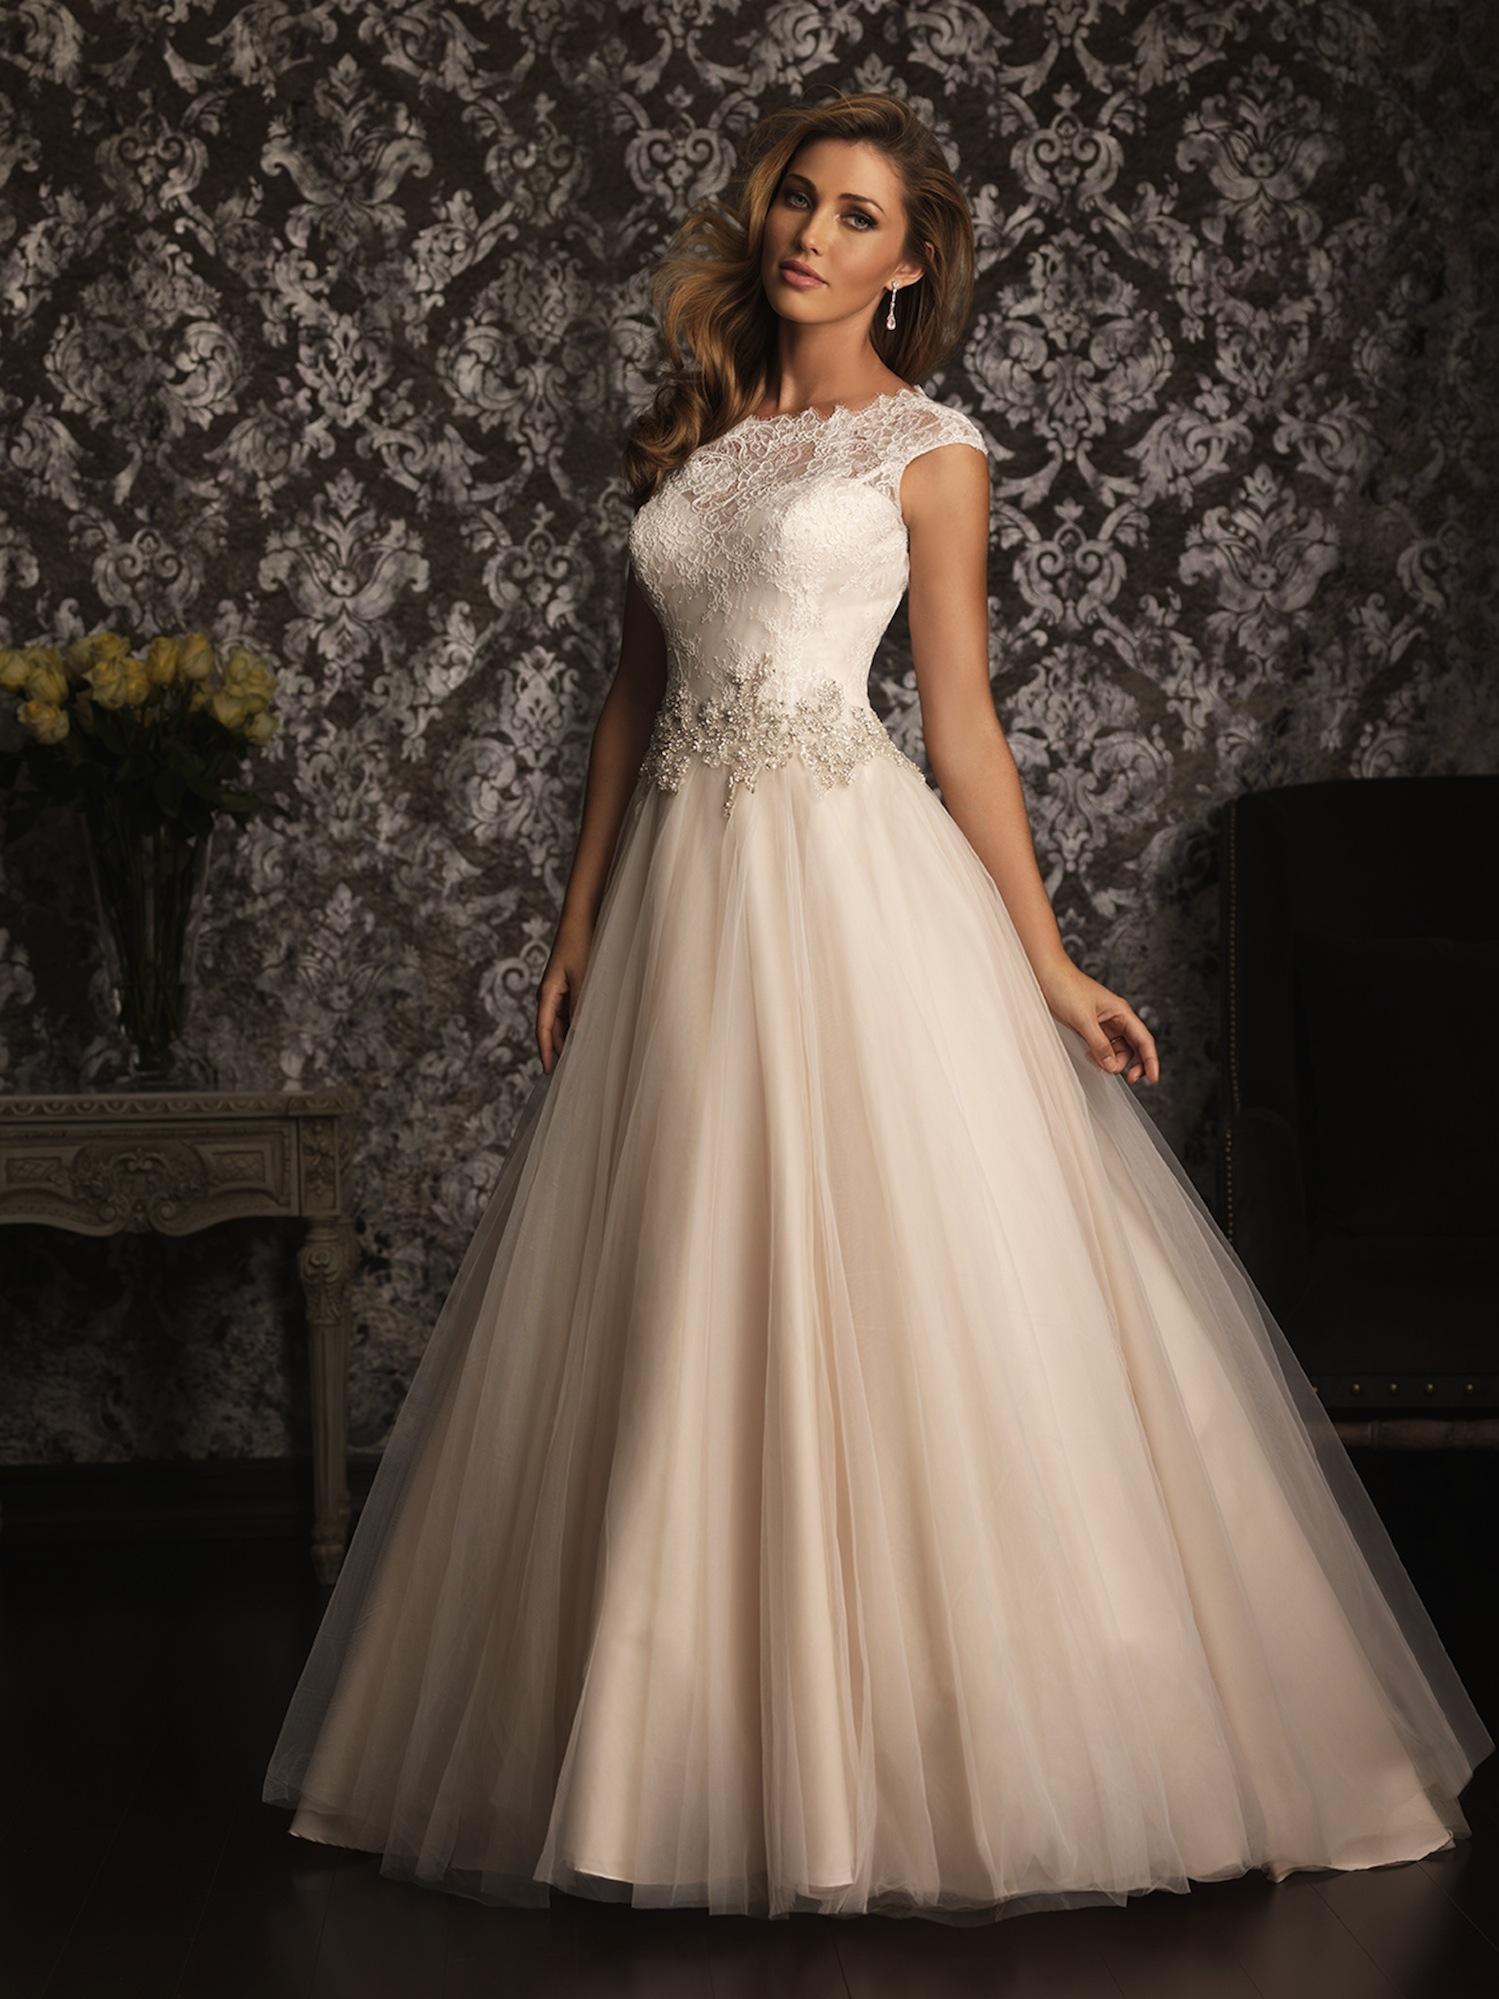 Allure Wedding Gowns 022 - Allure Wedding Gowns